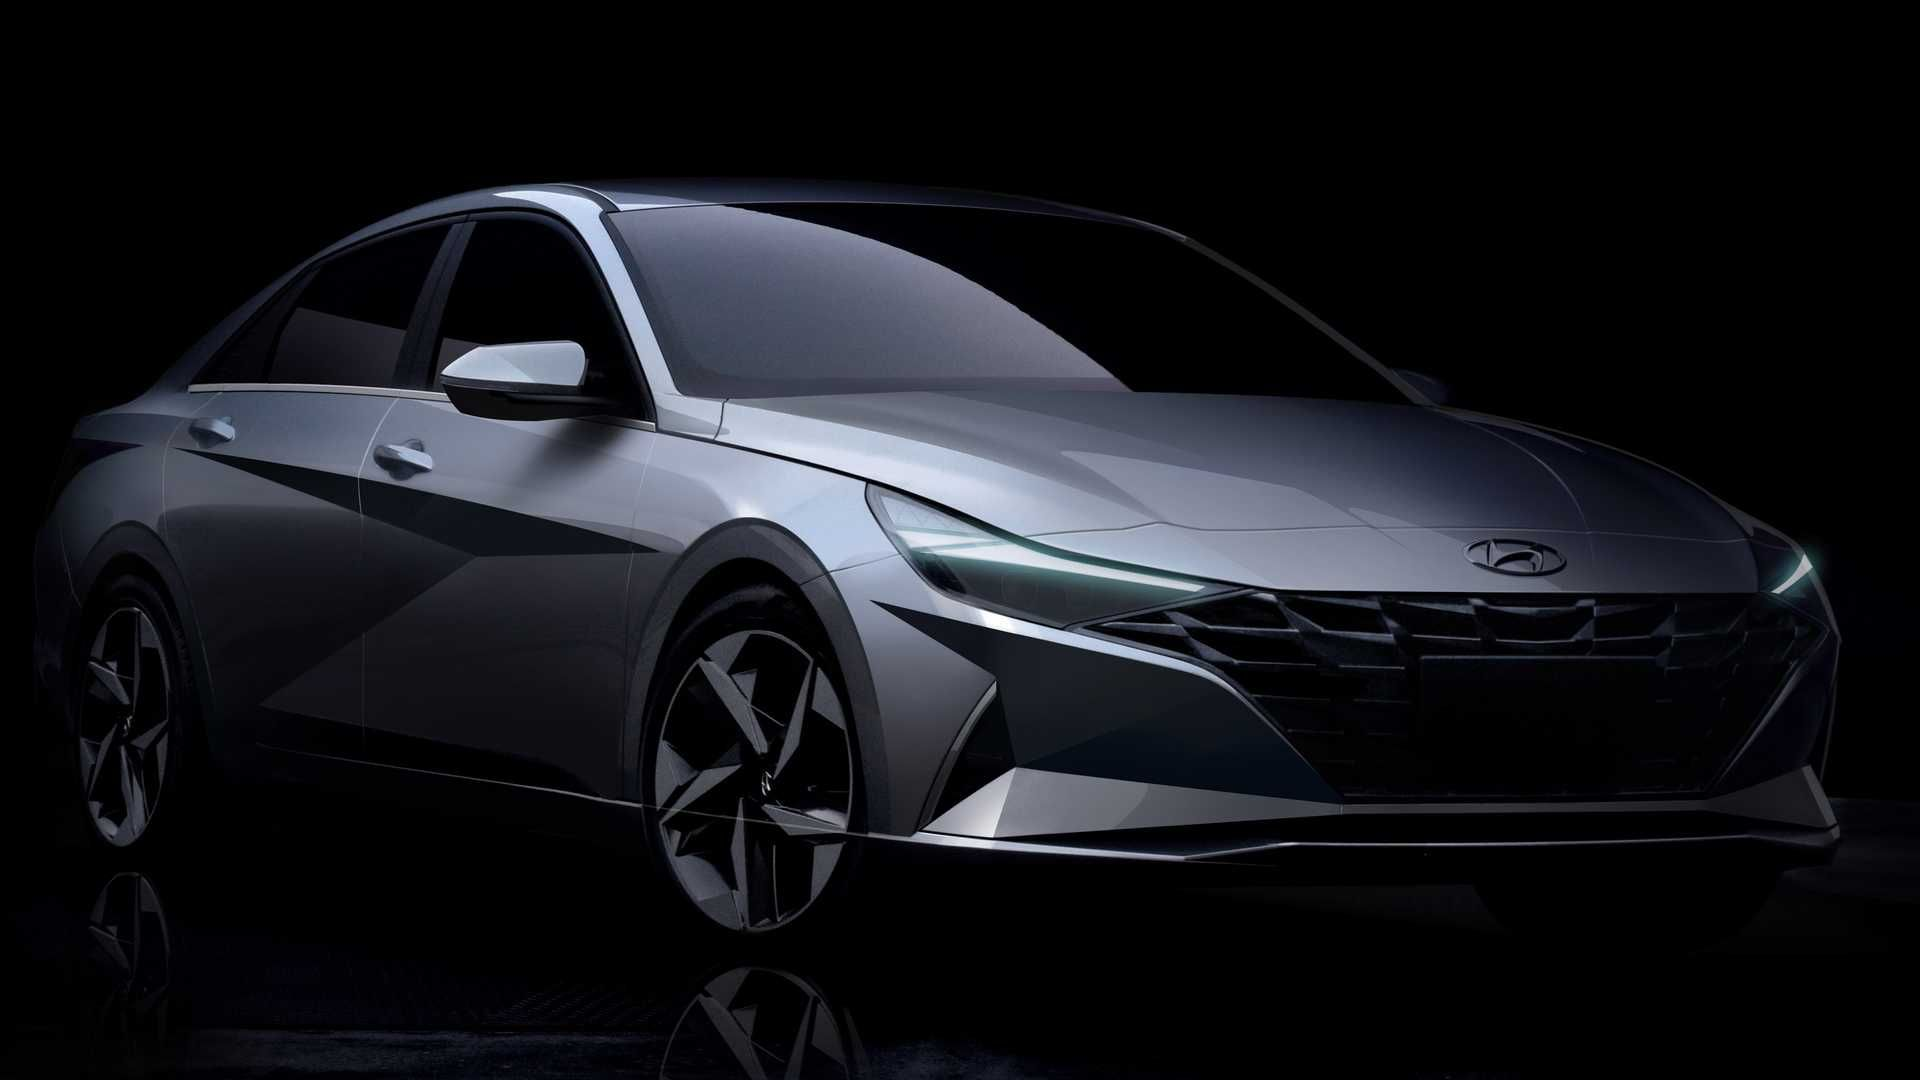 2021 Hyundai Elantra Debuts With Bigger Size, Upmarket